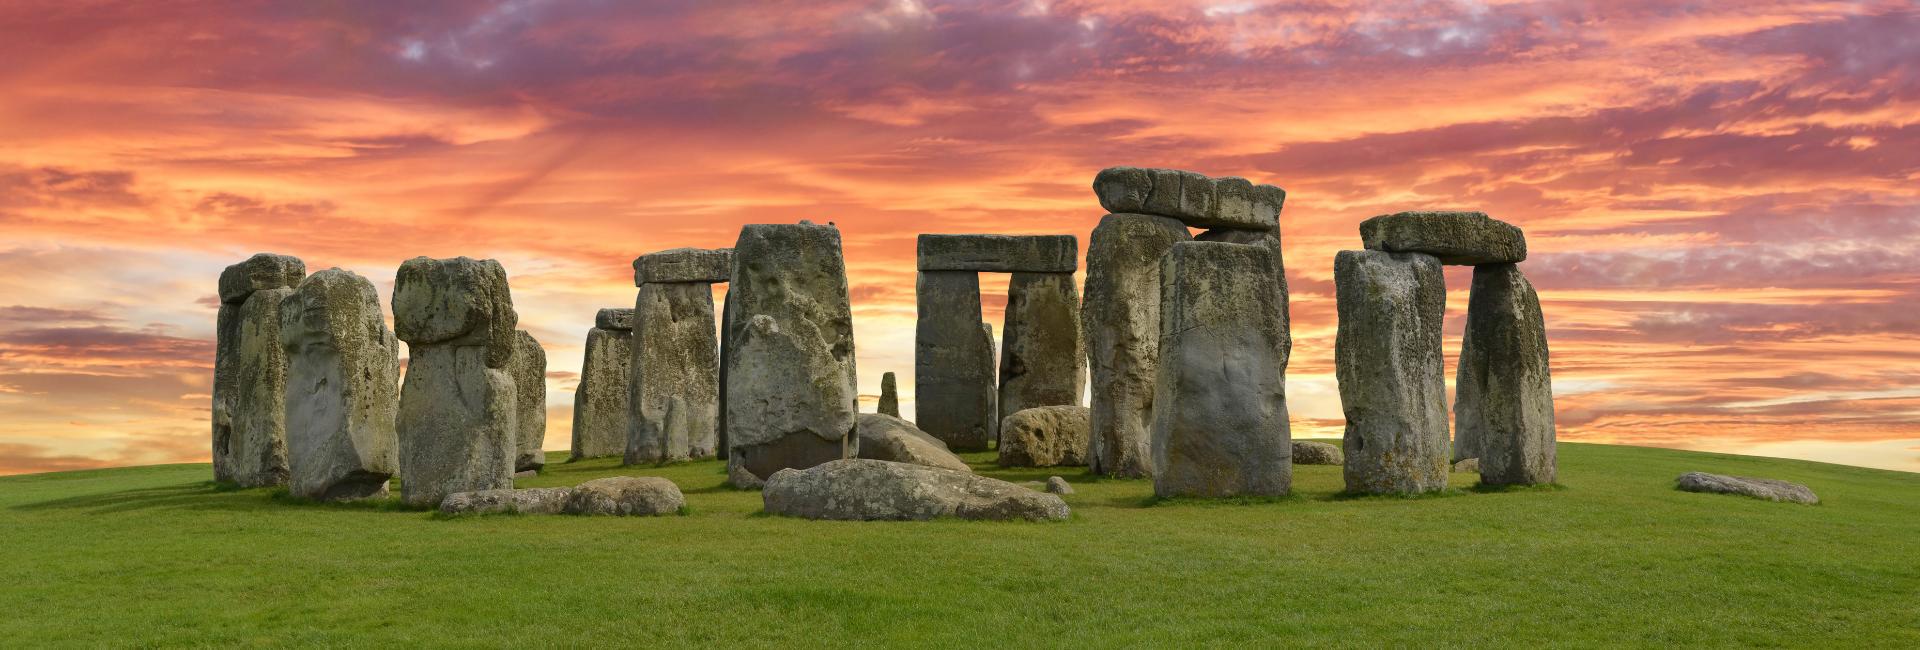 UNESCO World Heritage Sites in the UK: Stonehenge